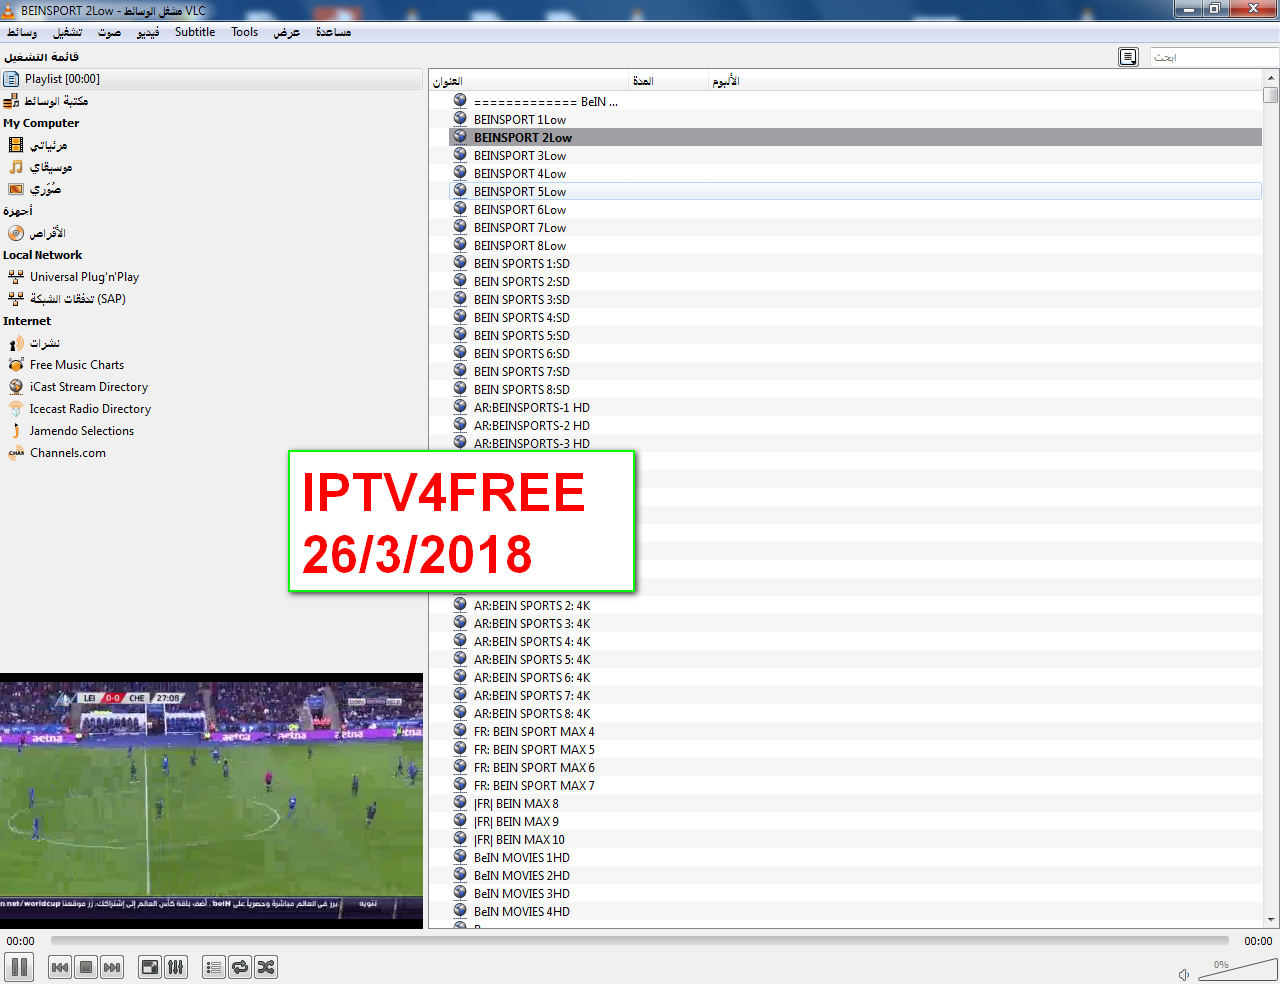 M3u8 playlist url | Share your IPTV M3U Playlists! : PleX